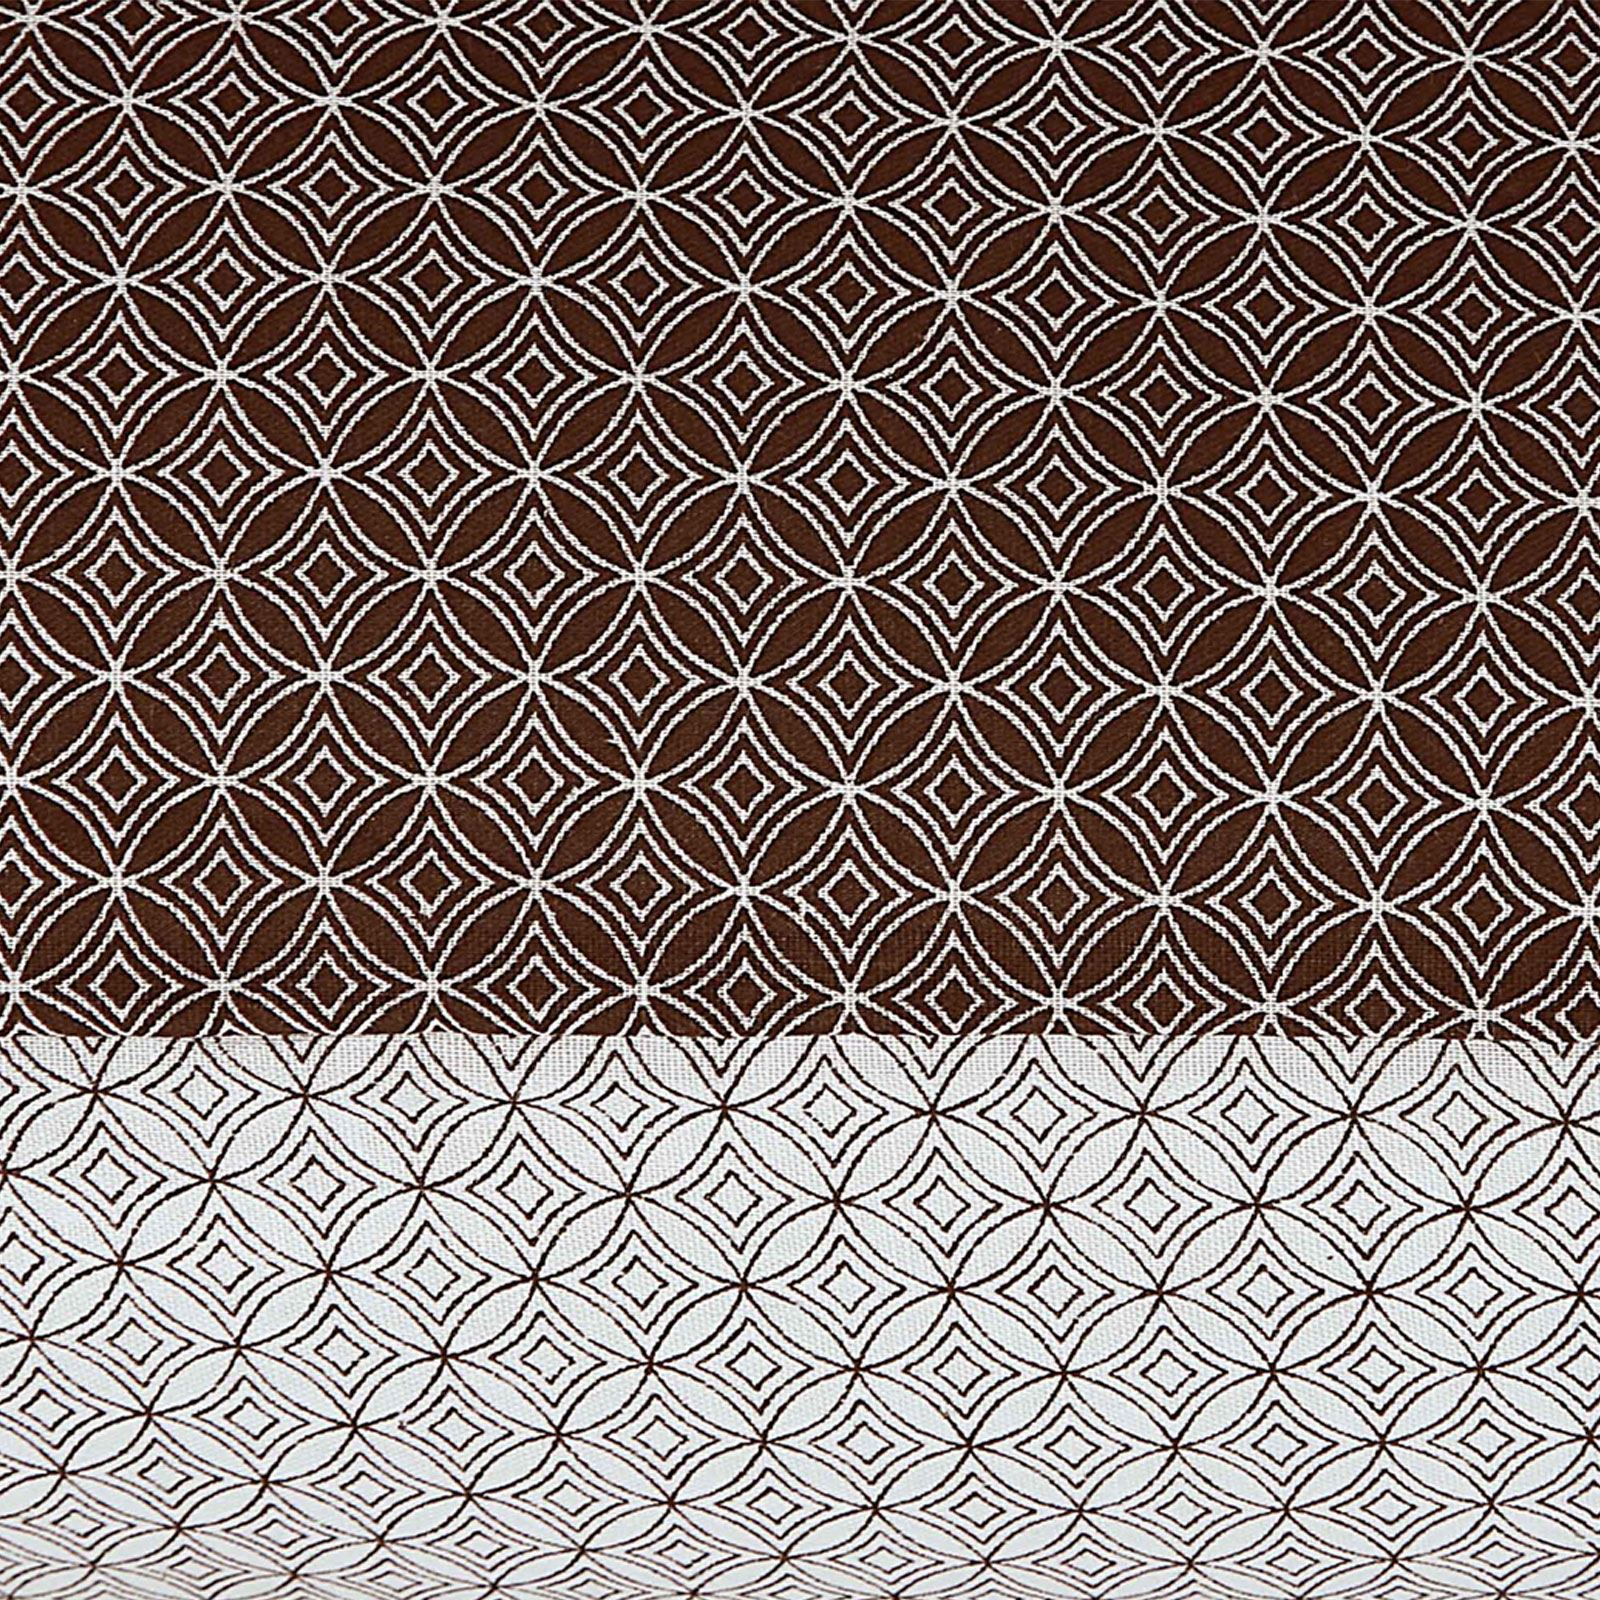 Funda-nordica-reversible-Geometrico-Edredon-Christian-lecho-solo-Doble-King miniatura 10